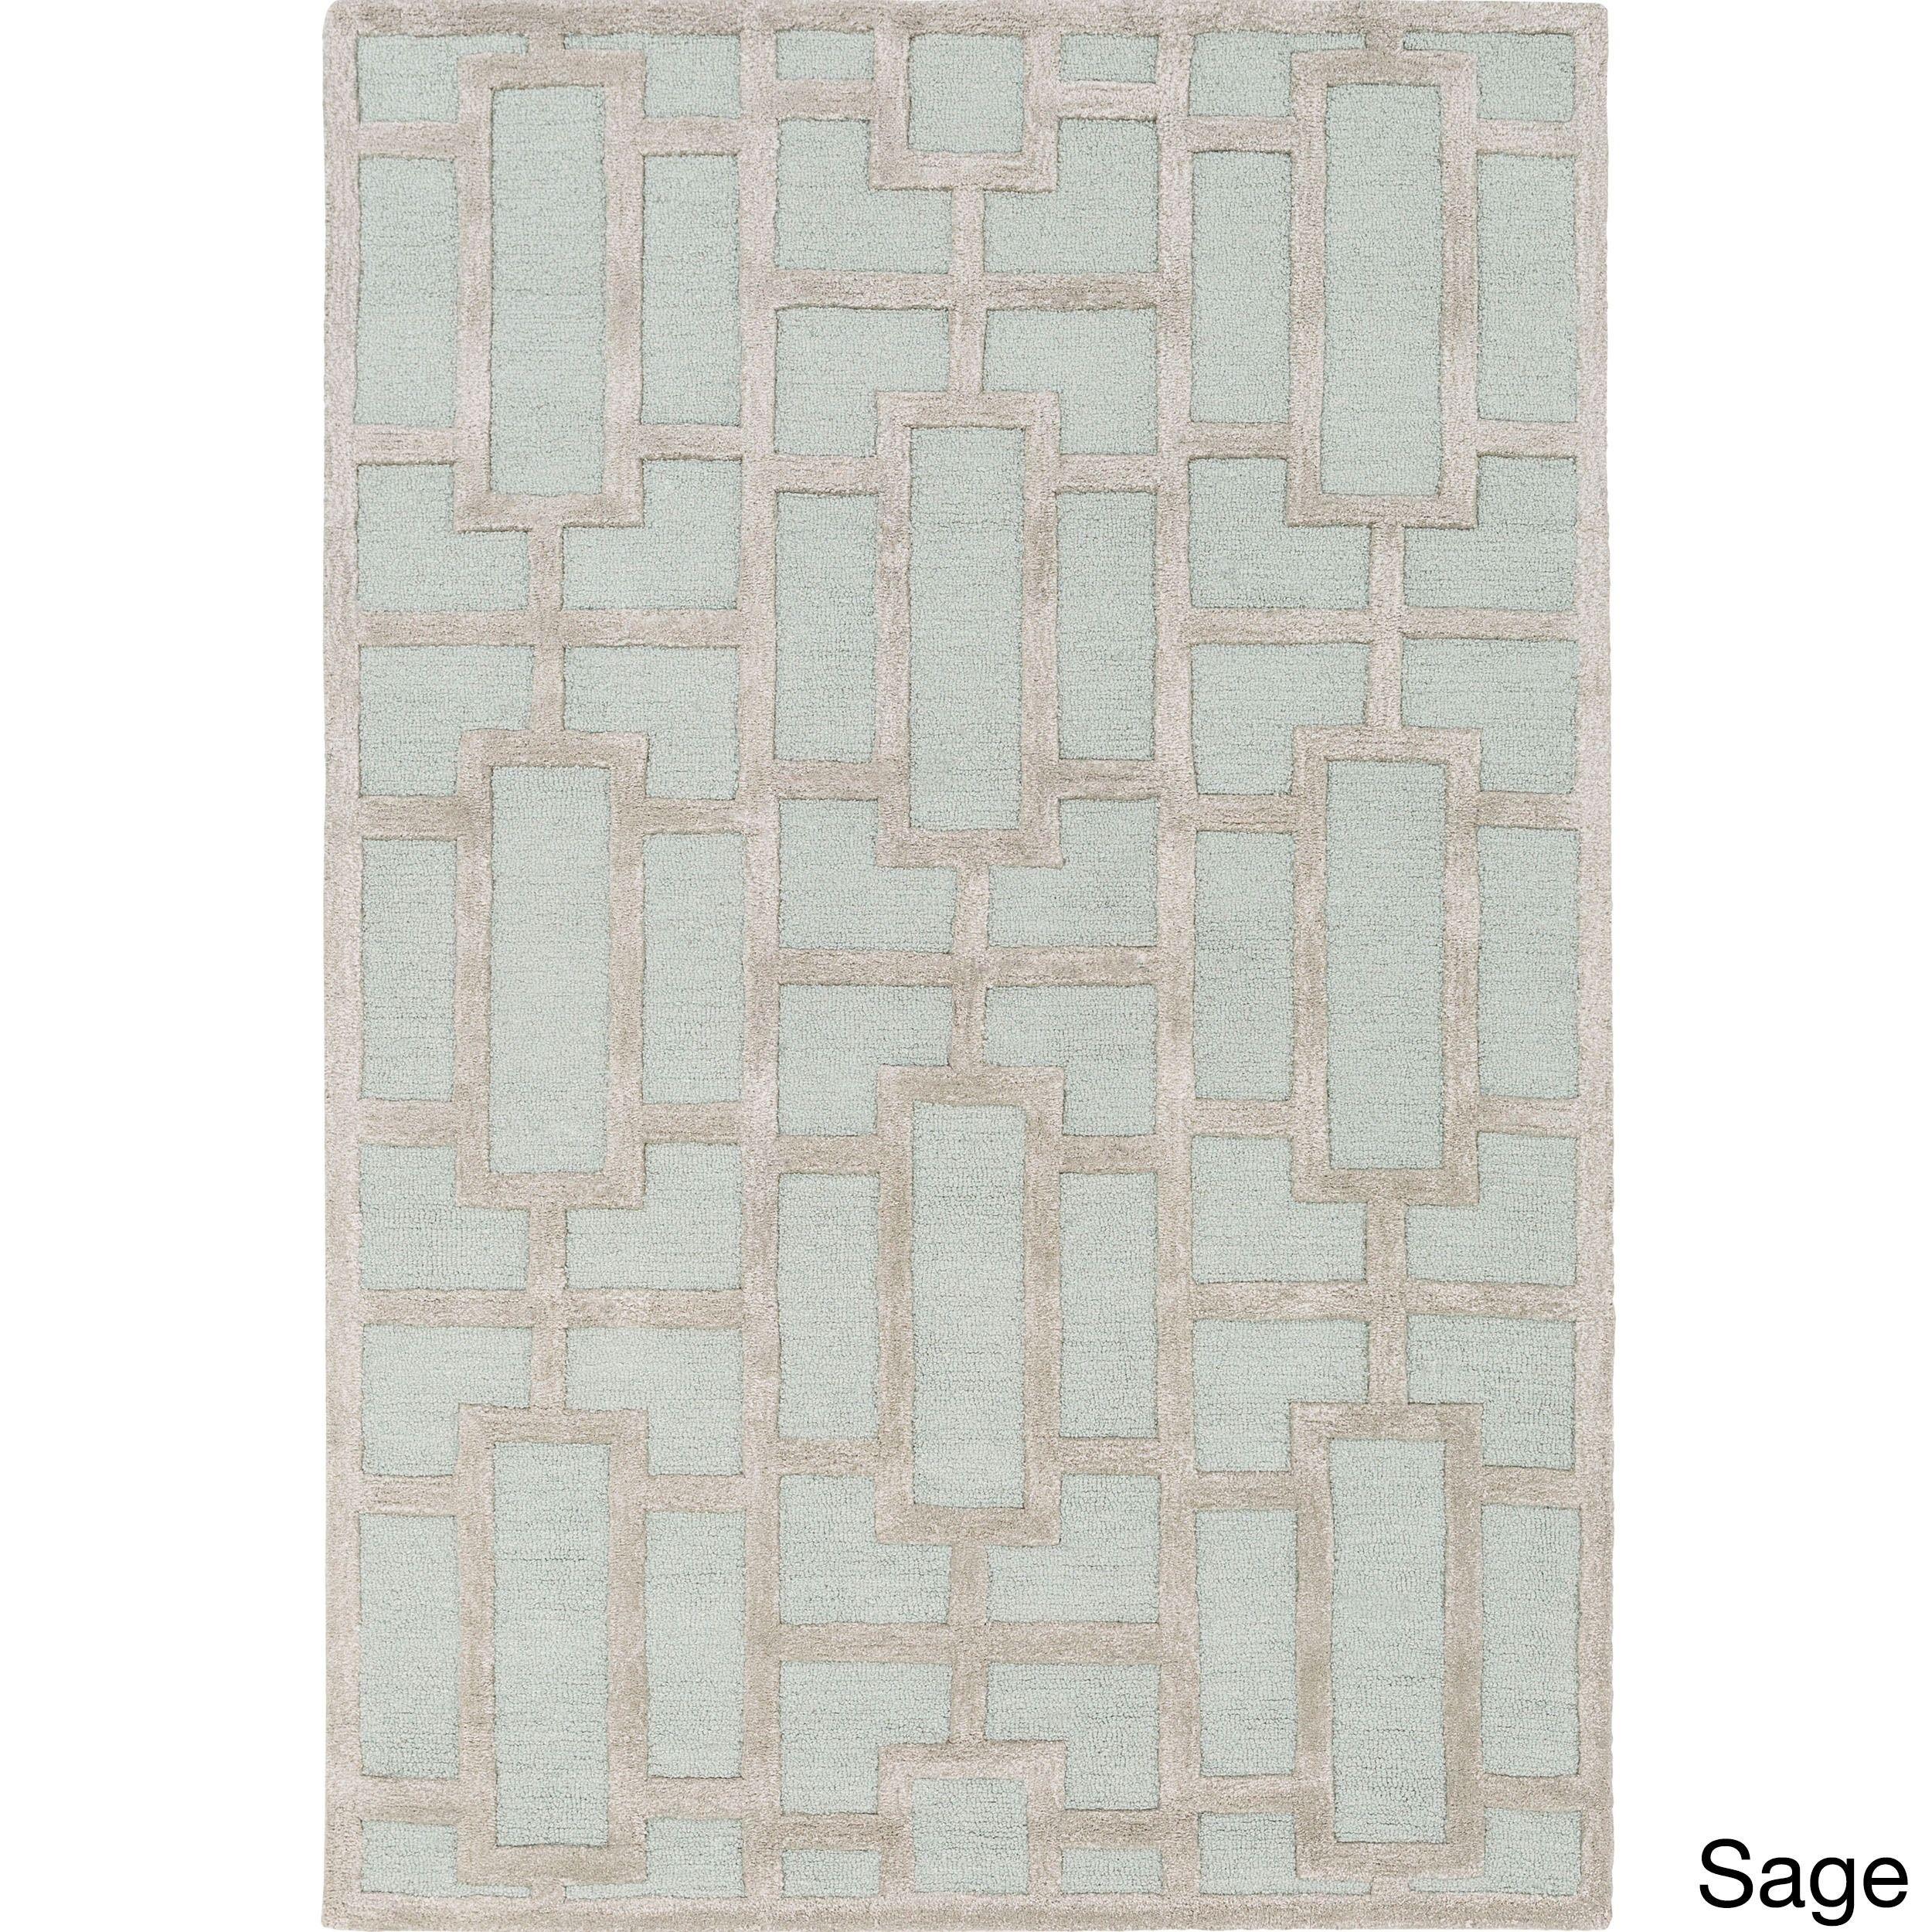 Hand Tufted Geometric Wool Rug 9 X 13 Sage Green Light